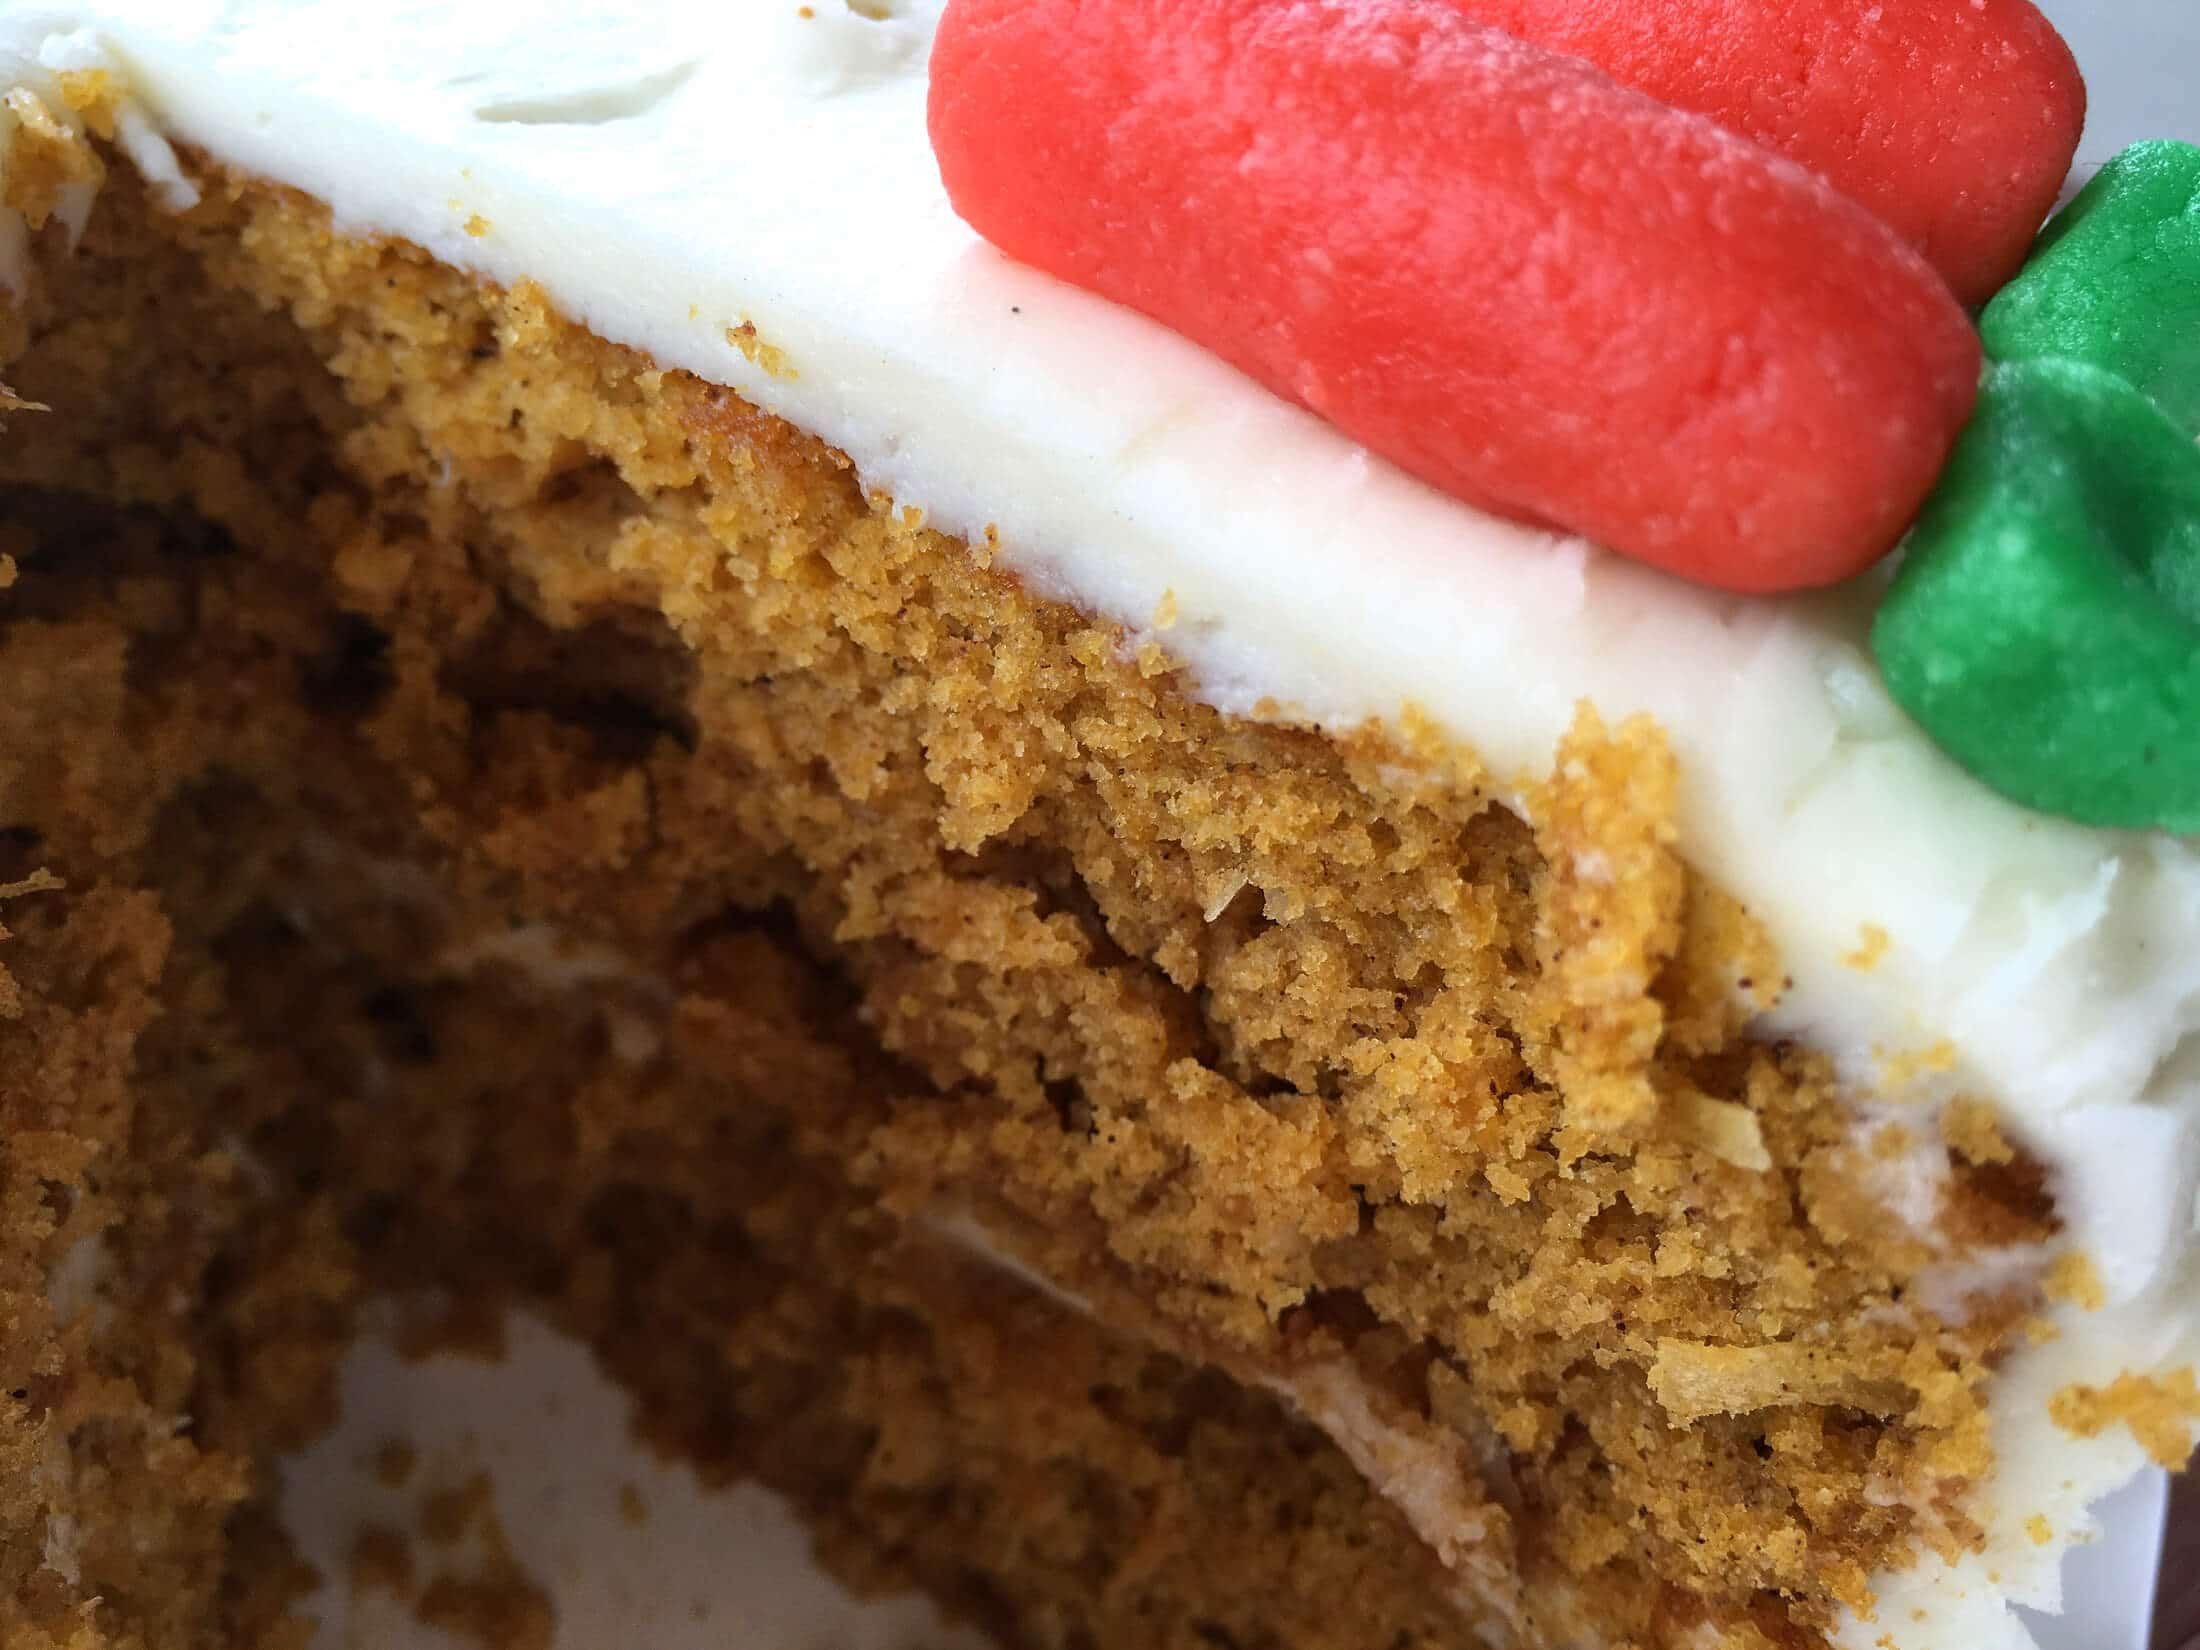 best gluten free carrot cake recipe baking dessert dairy free pineapple coconut marzipan